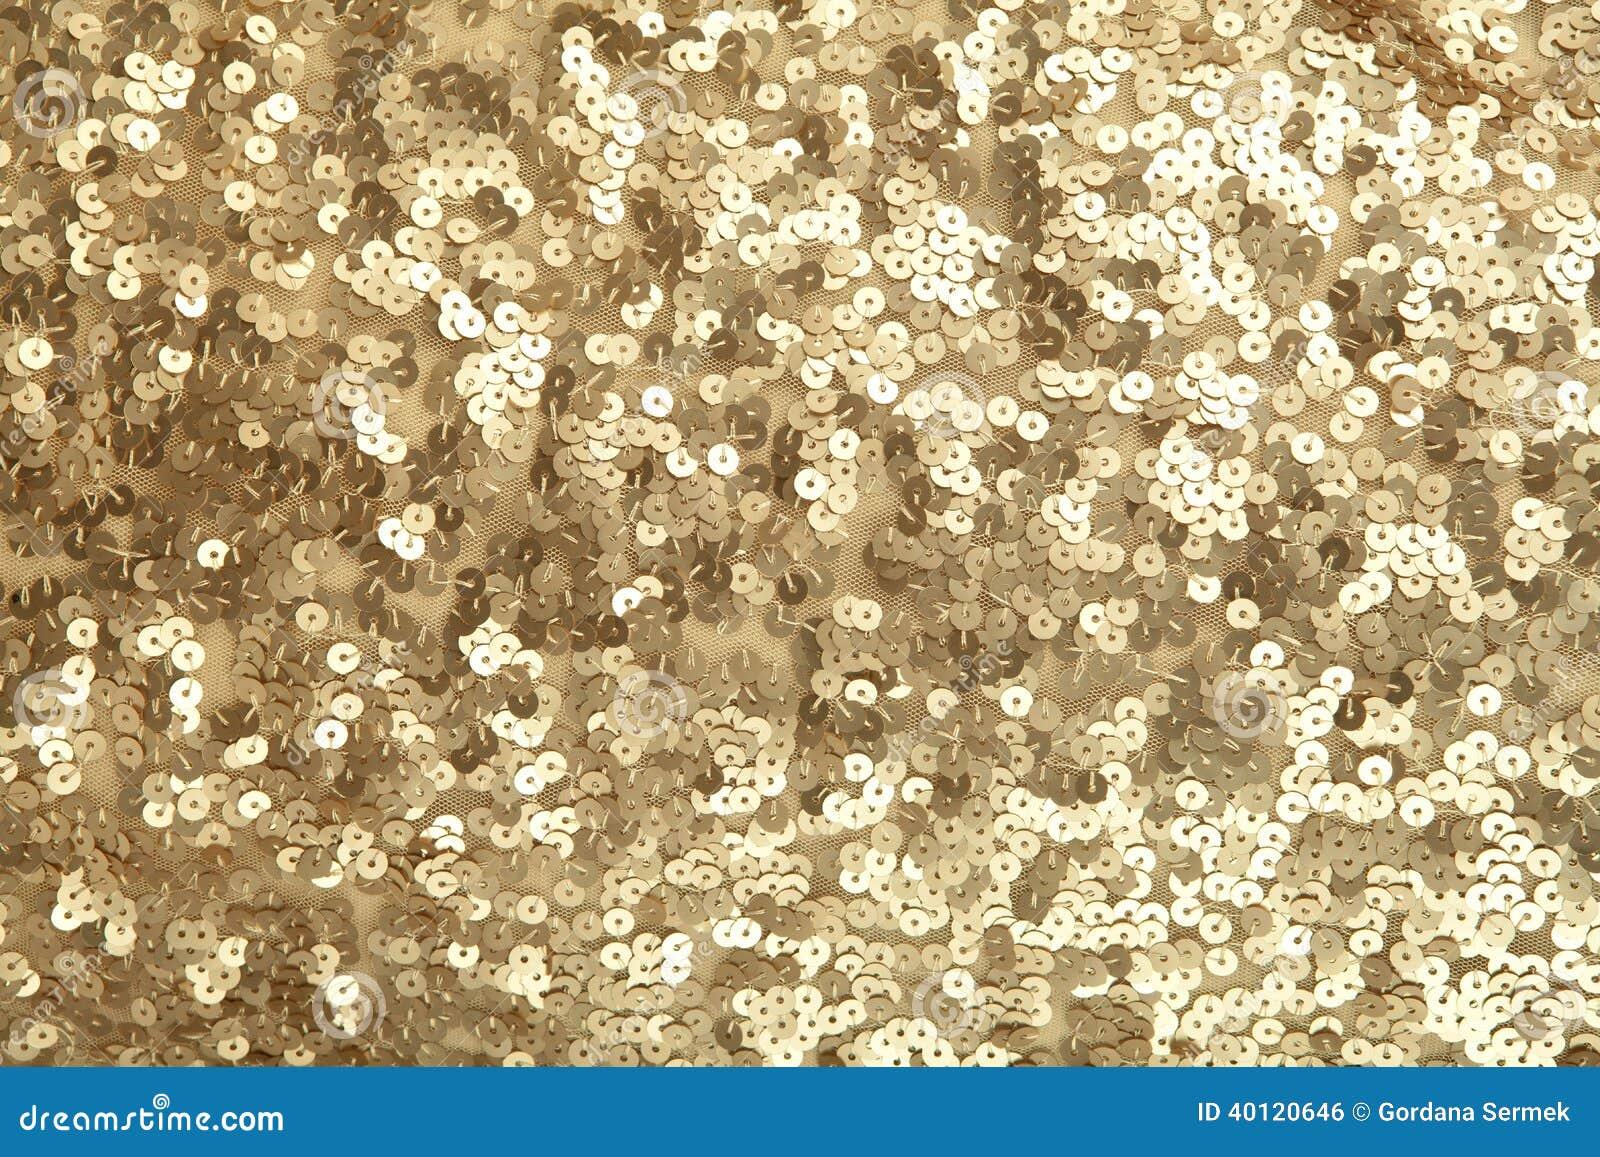 paillettes d 39 or photo stock image du perl sequined 40120646. Black Bedroom Furniture Sets. Home Design Ideas